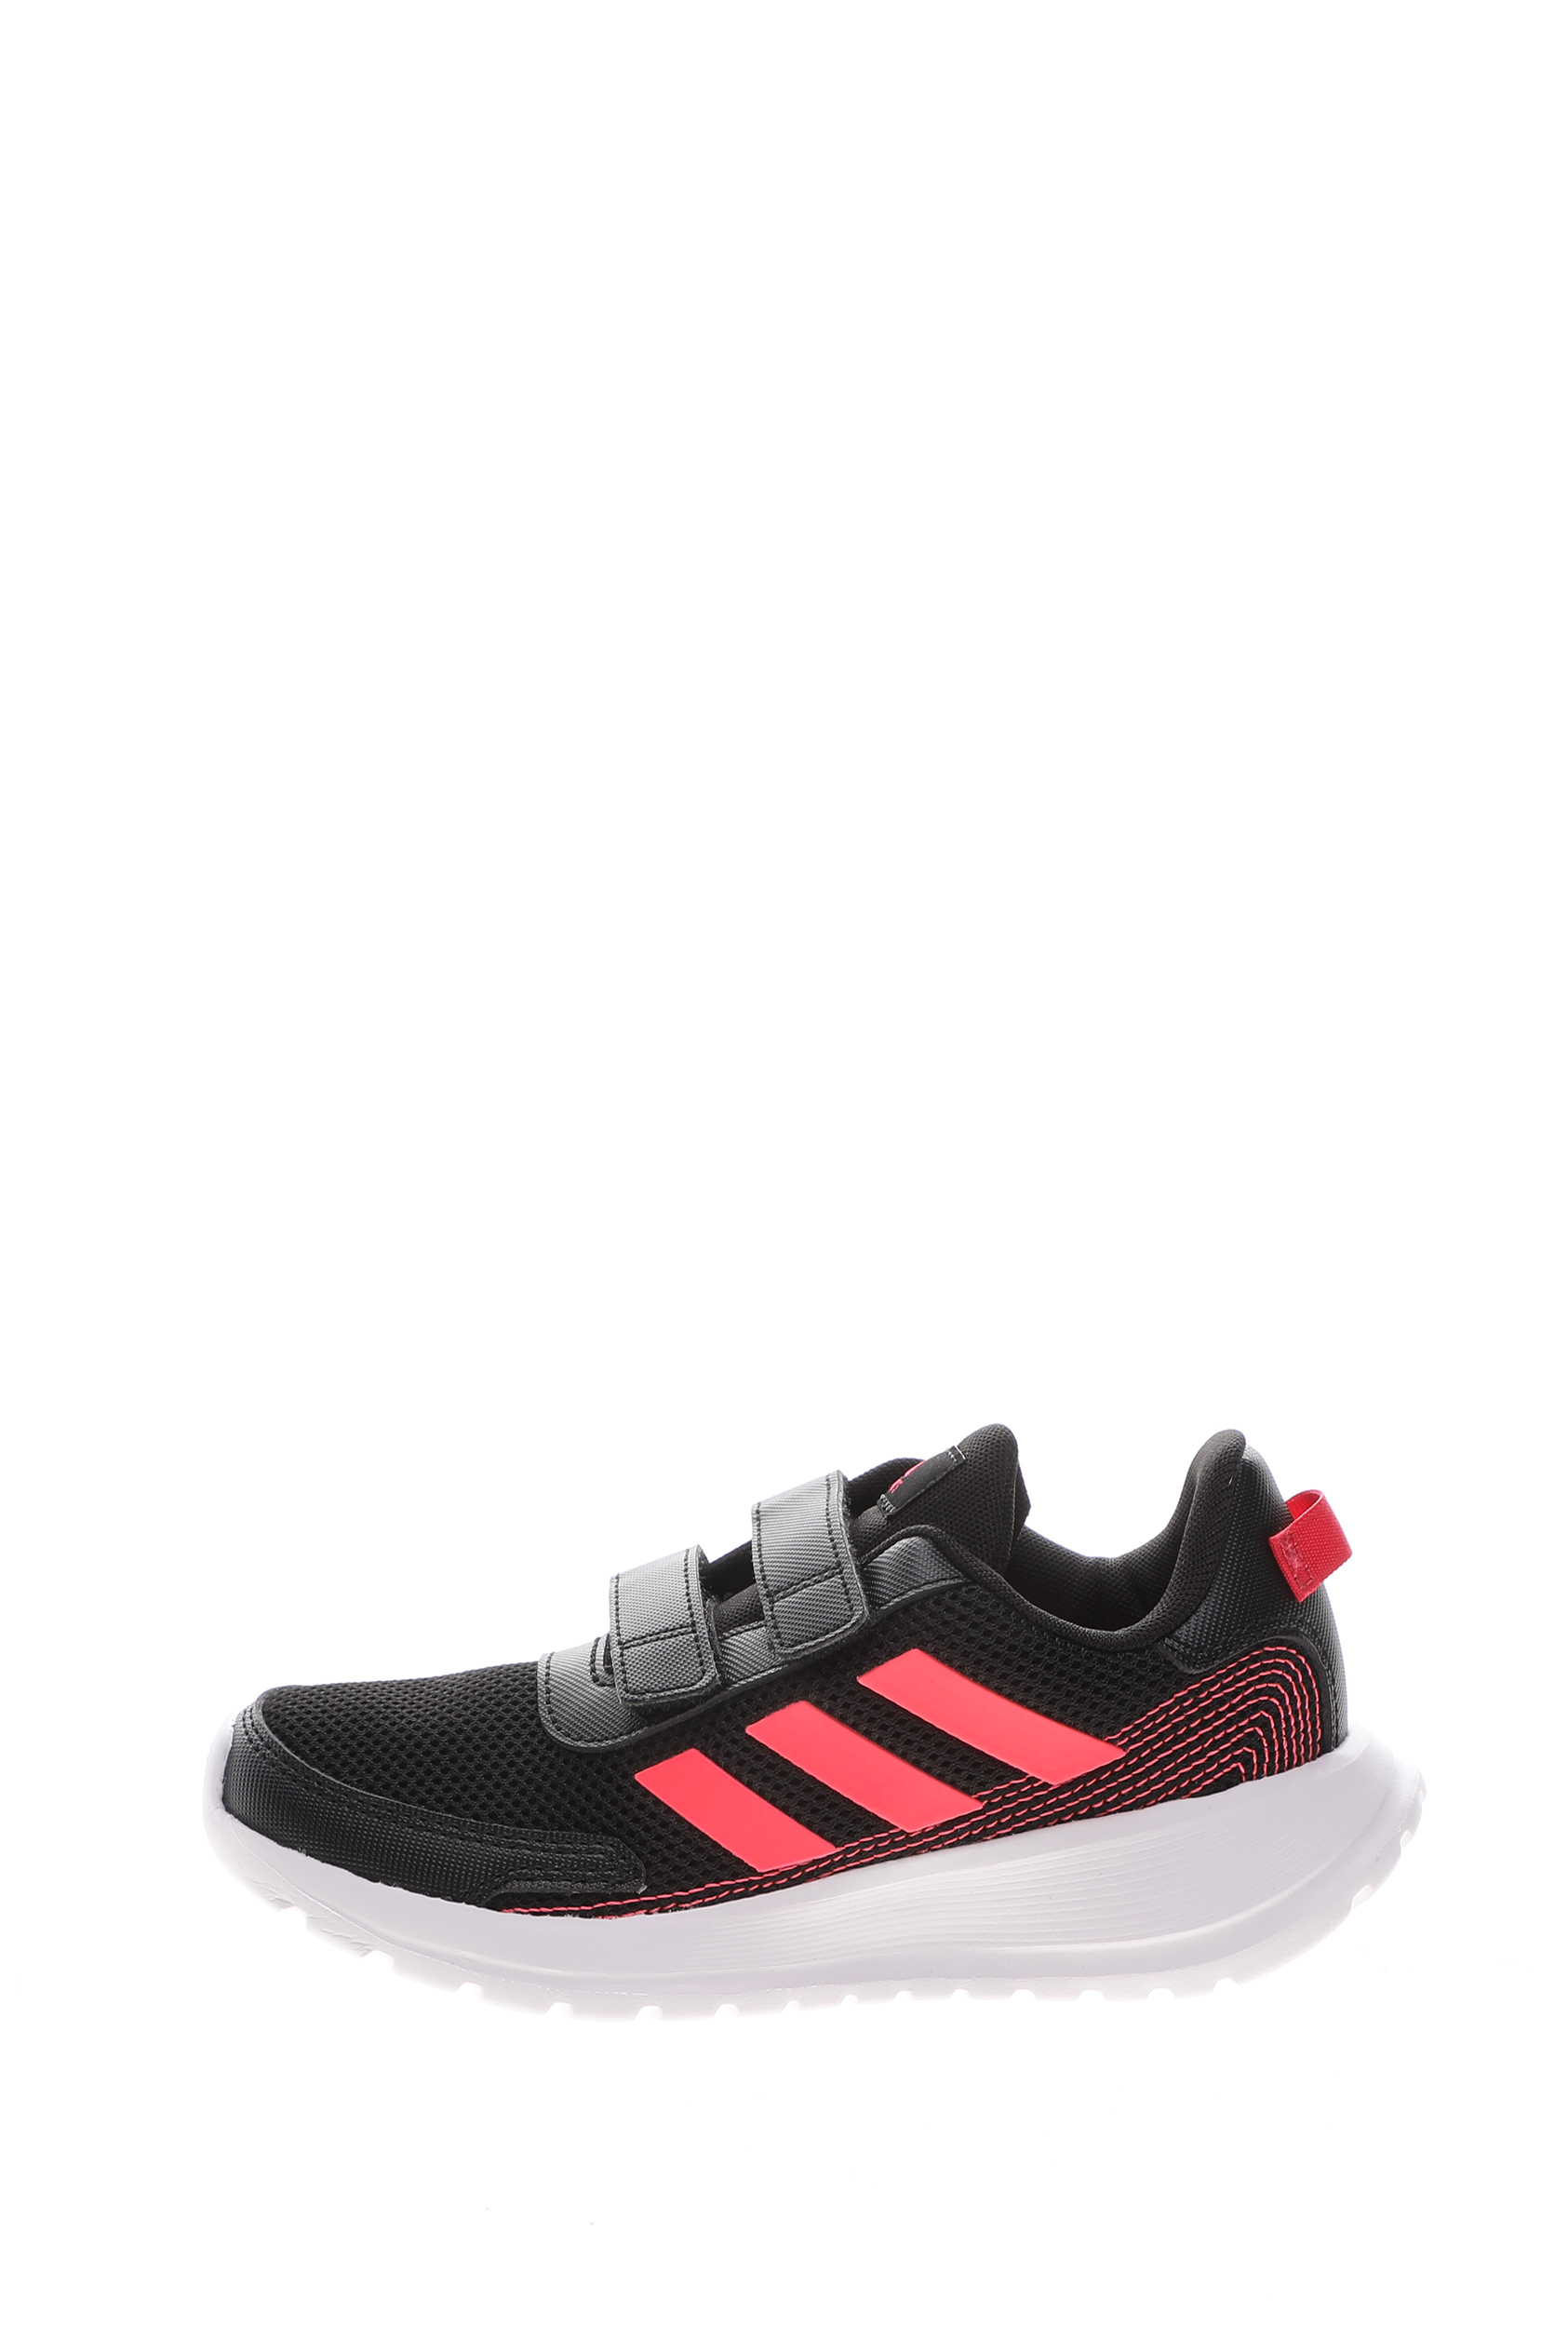 ADIDAS – Βρεφικά αθλητικά παπούτσια adidas TENSOR C μάυρα